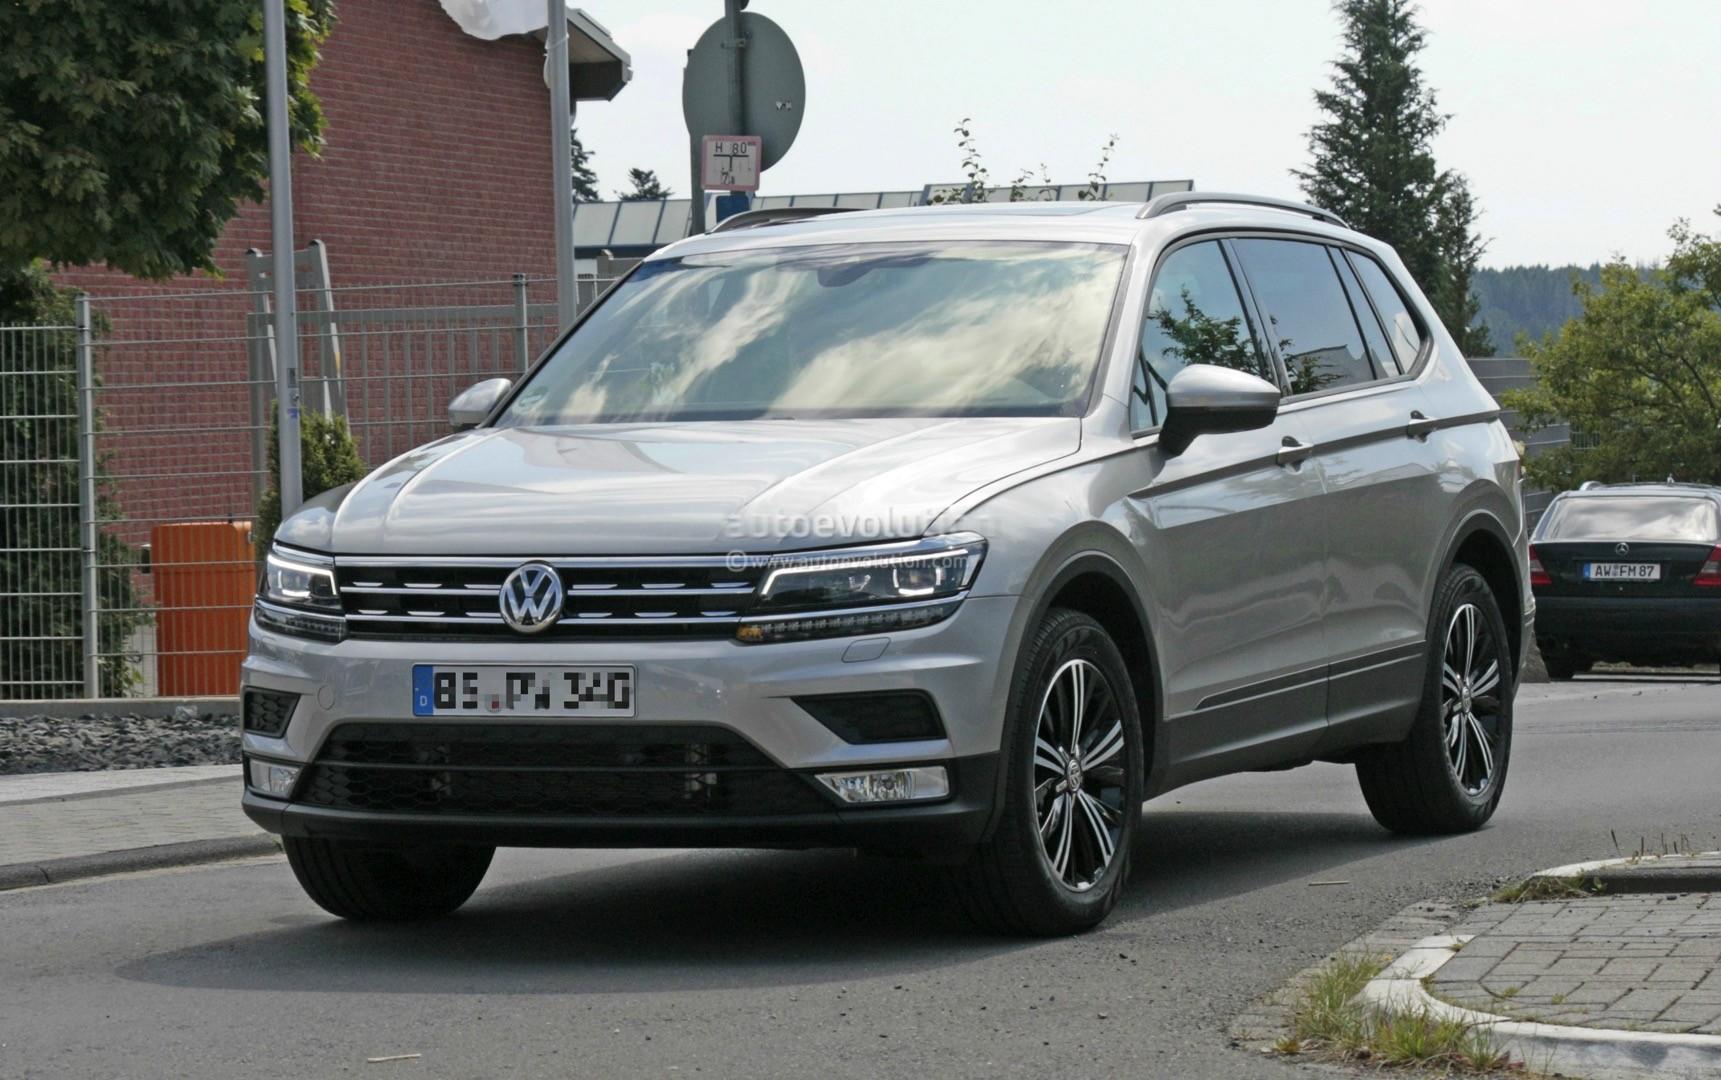 2018 Volkswagen Tiguan Allspace 7 Seater Teased For